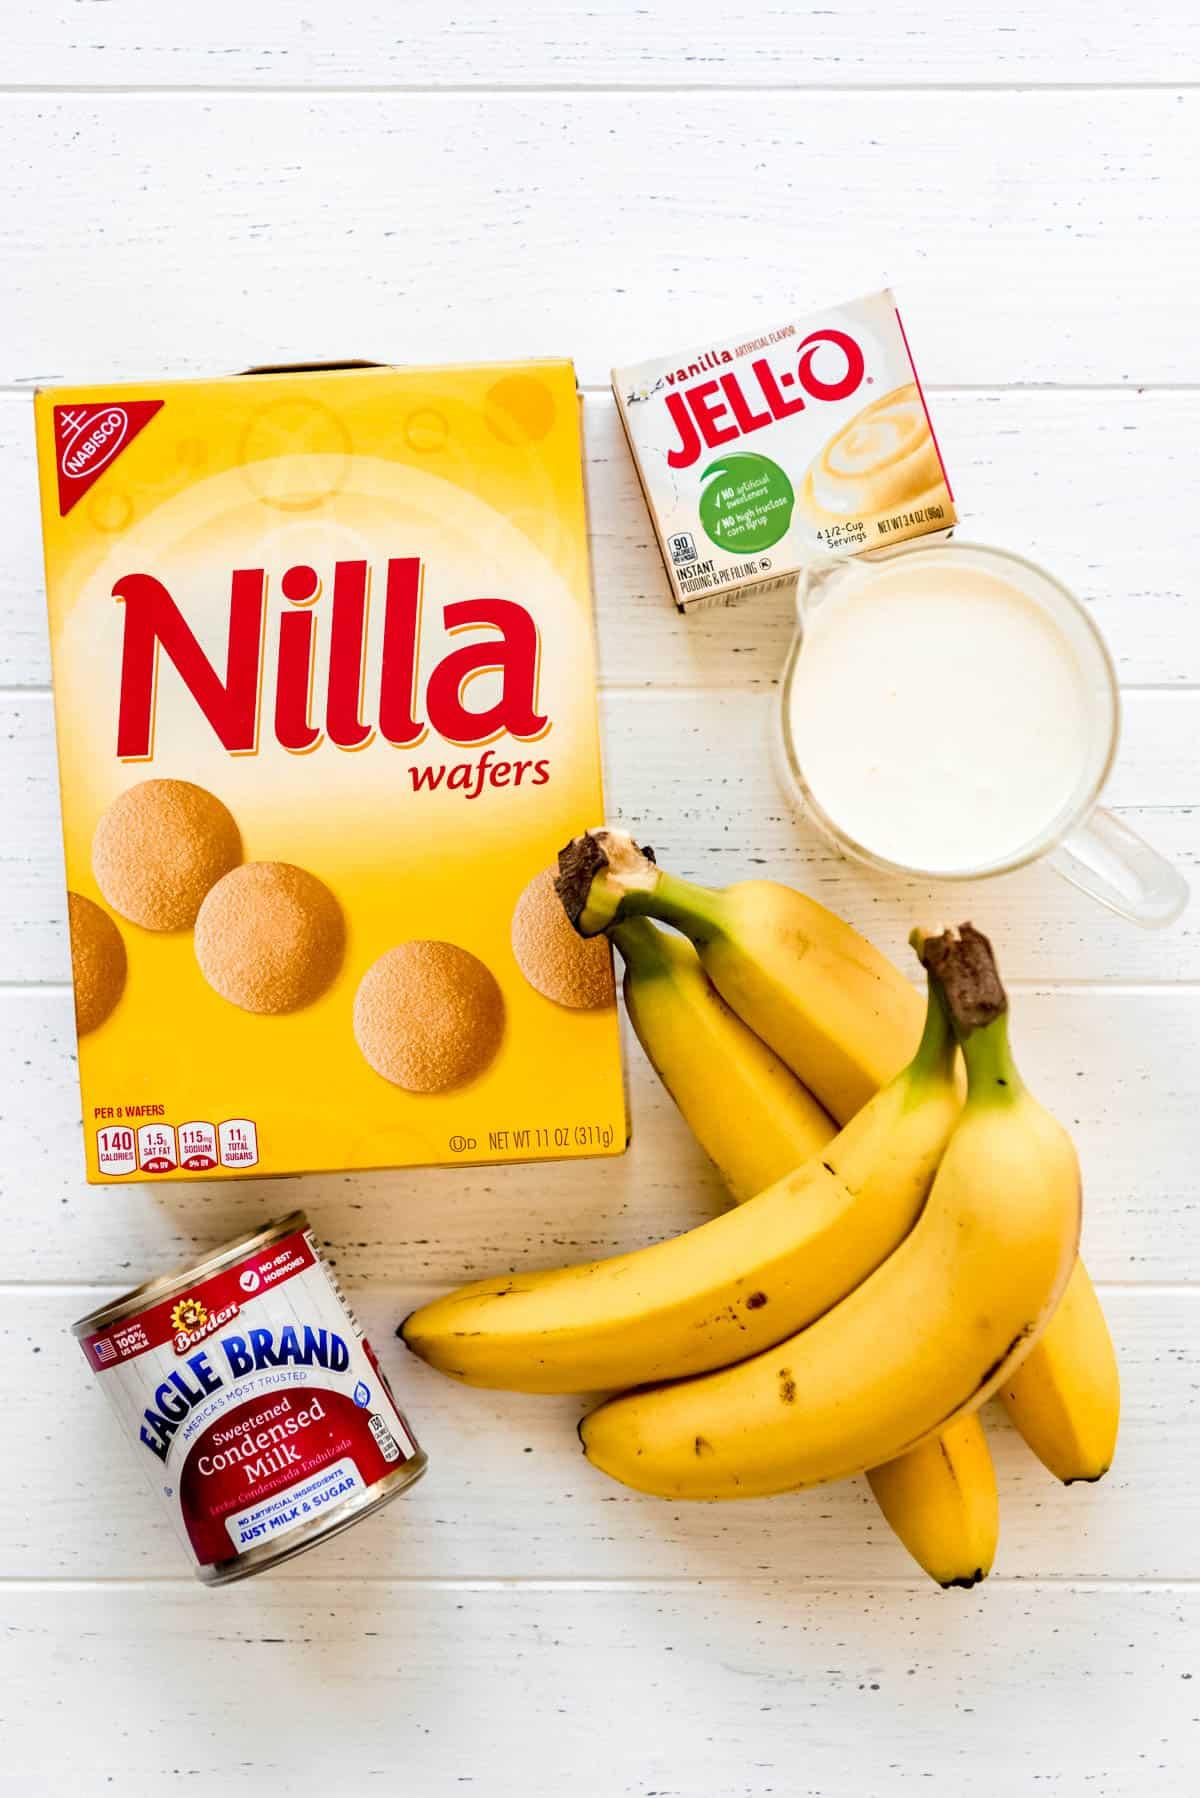 Nilla wafers, Jell-o Instant Pudding, heavy cream, bananas, condensed milk